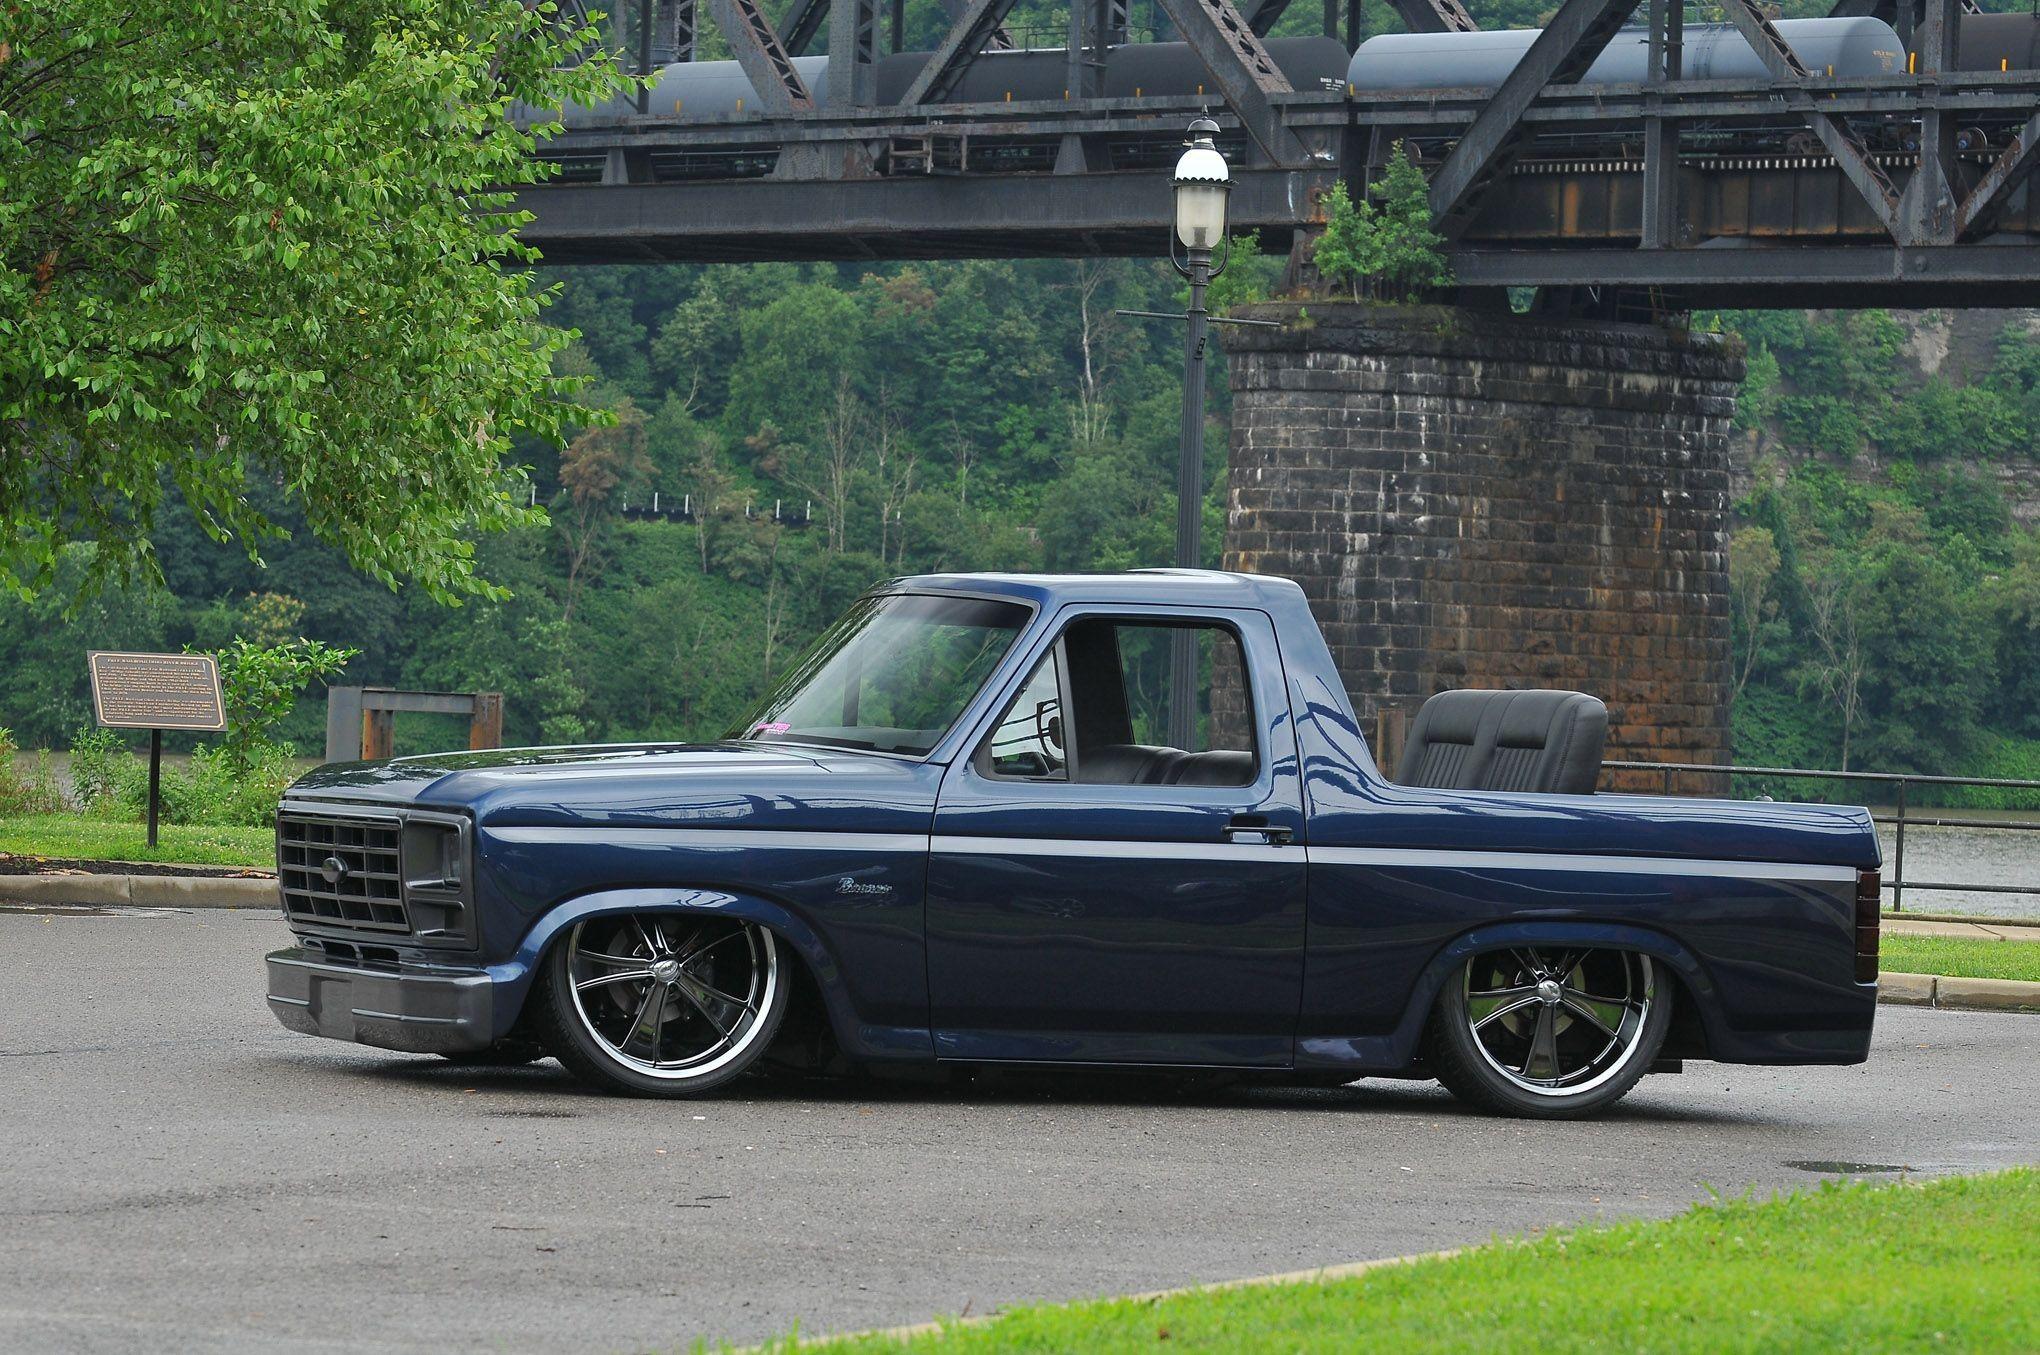 86 Ford Bronco Ford Bronco Ford Pickup Trucks Ford Pickup